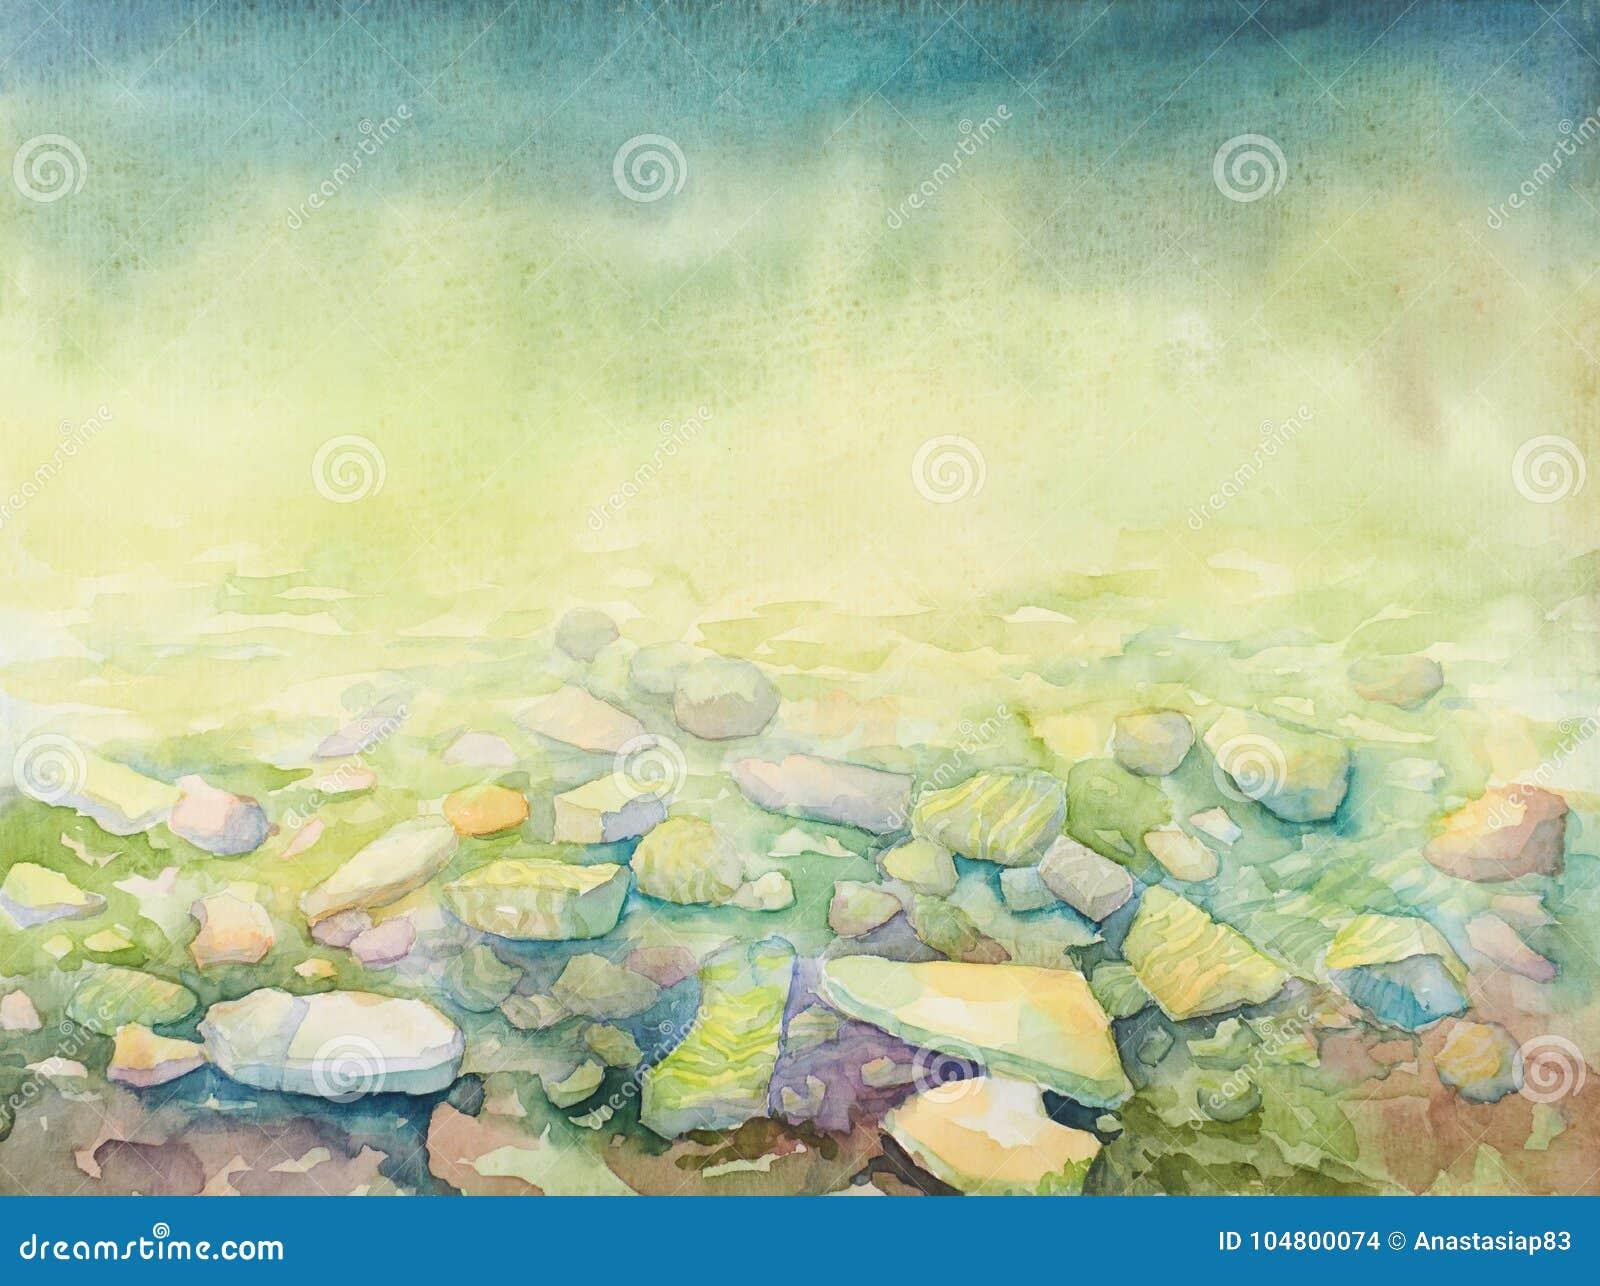 Hand drawn watercolor sea depth and beach shore pebbles